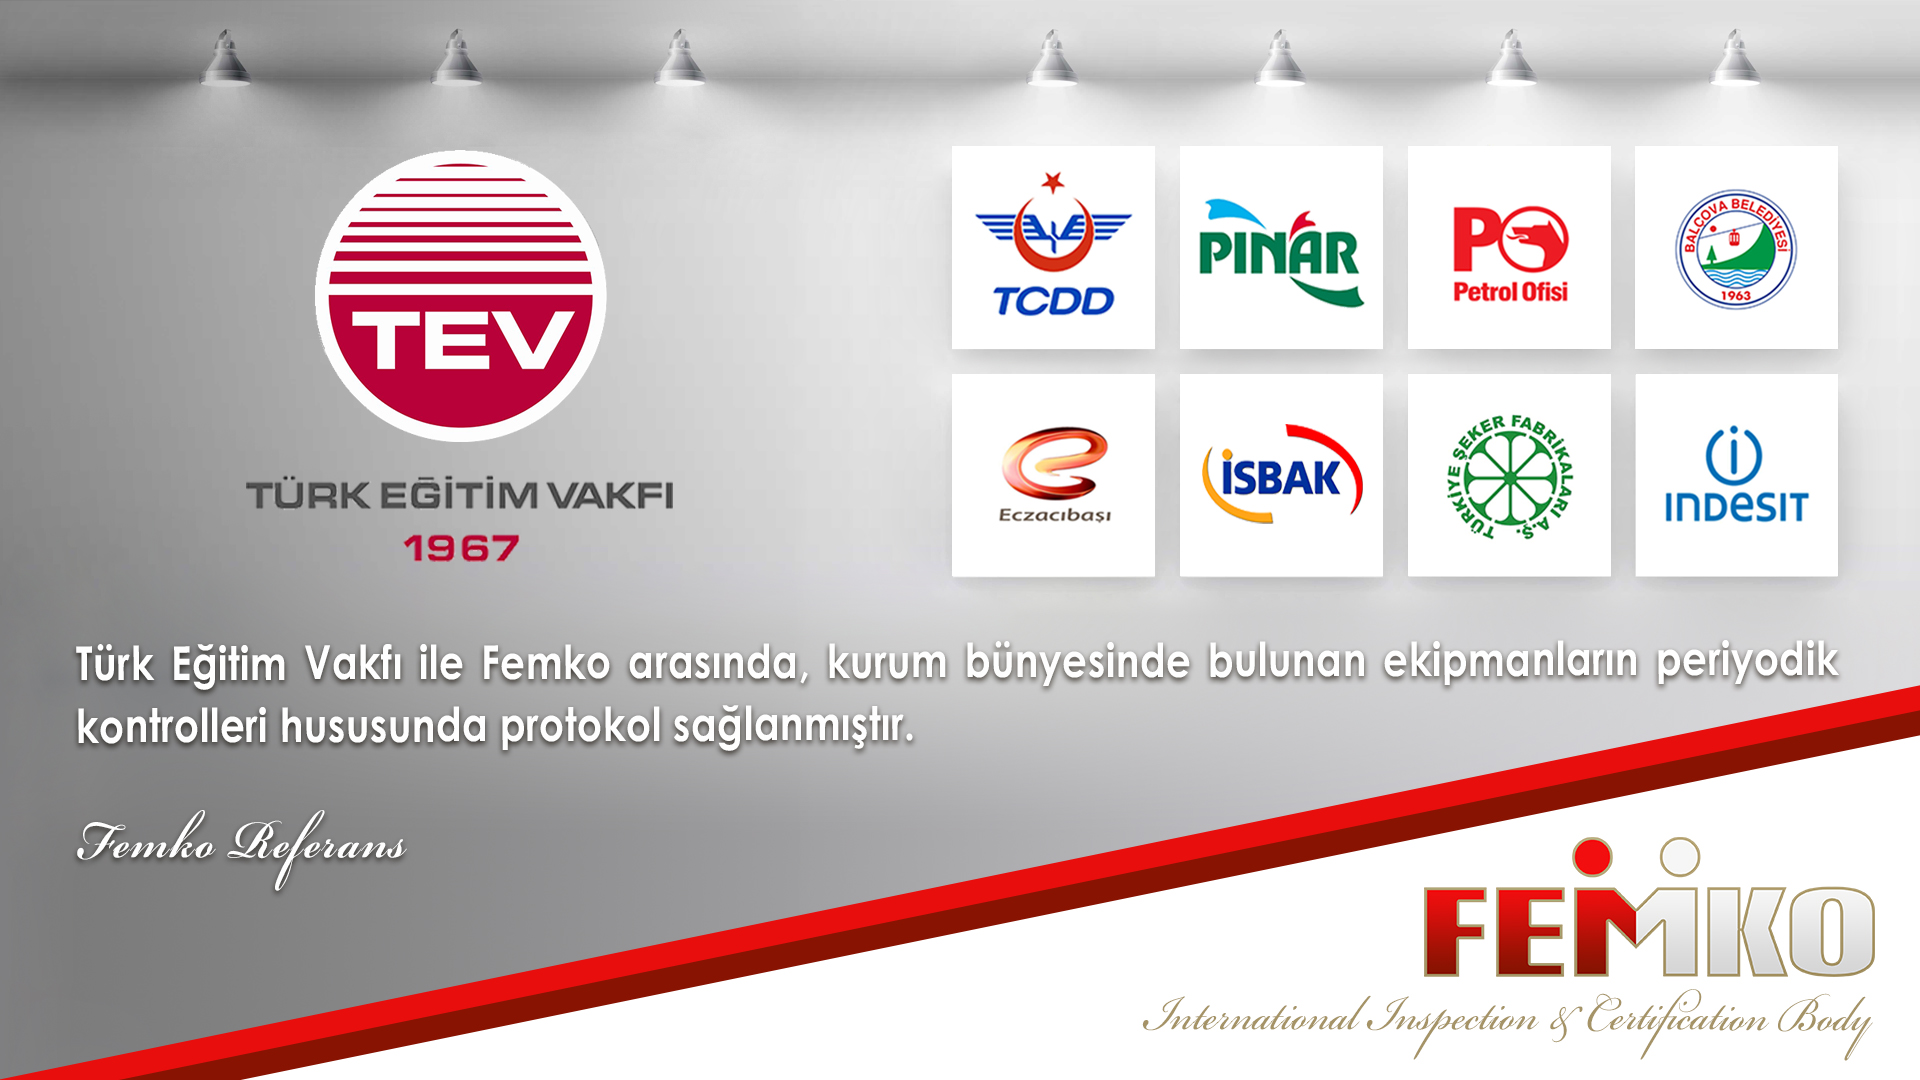 femko-referans-turk-egitim-vakfi